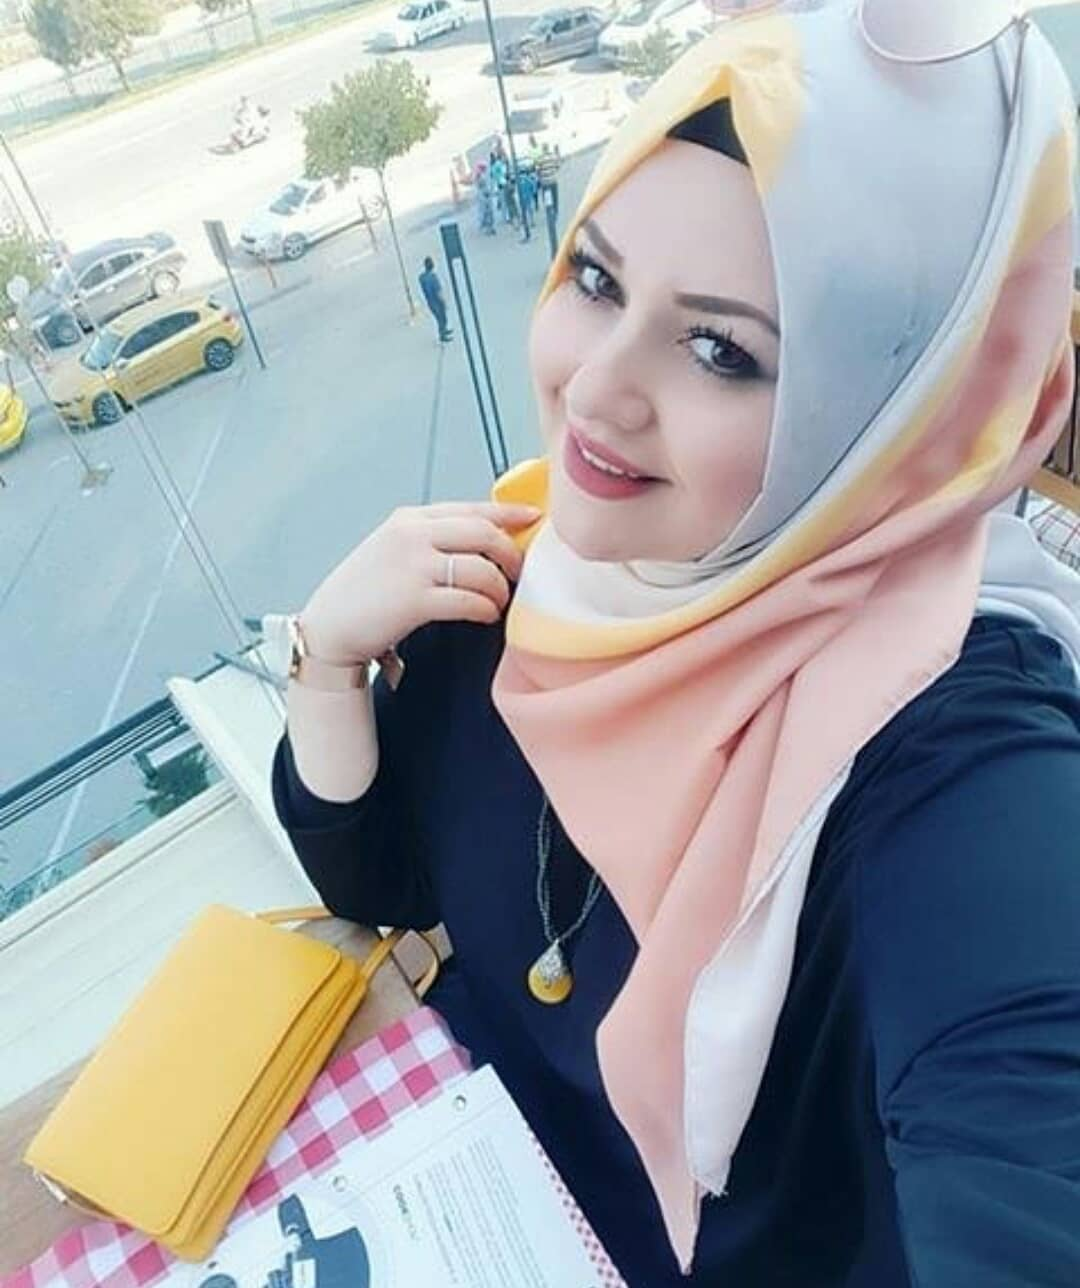 صور صورجميلة بنات محجبات , فتيات حلوات بالحجاب